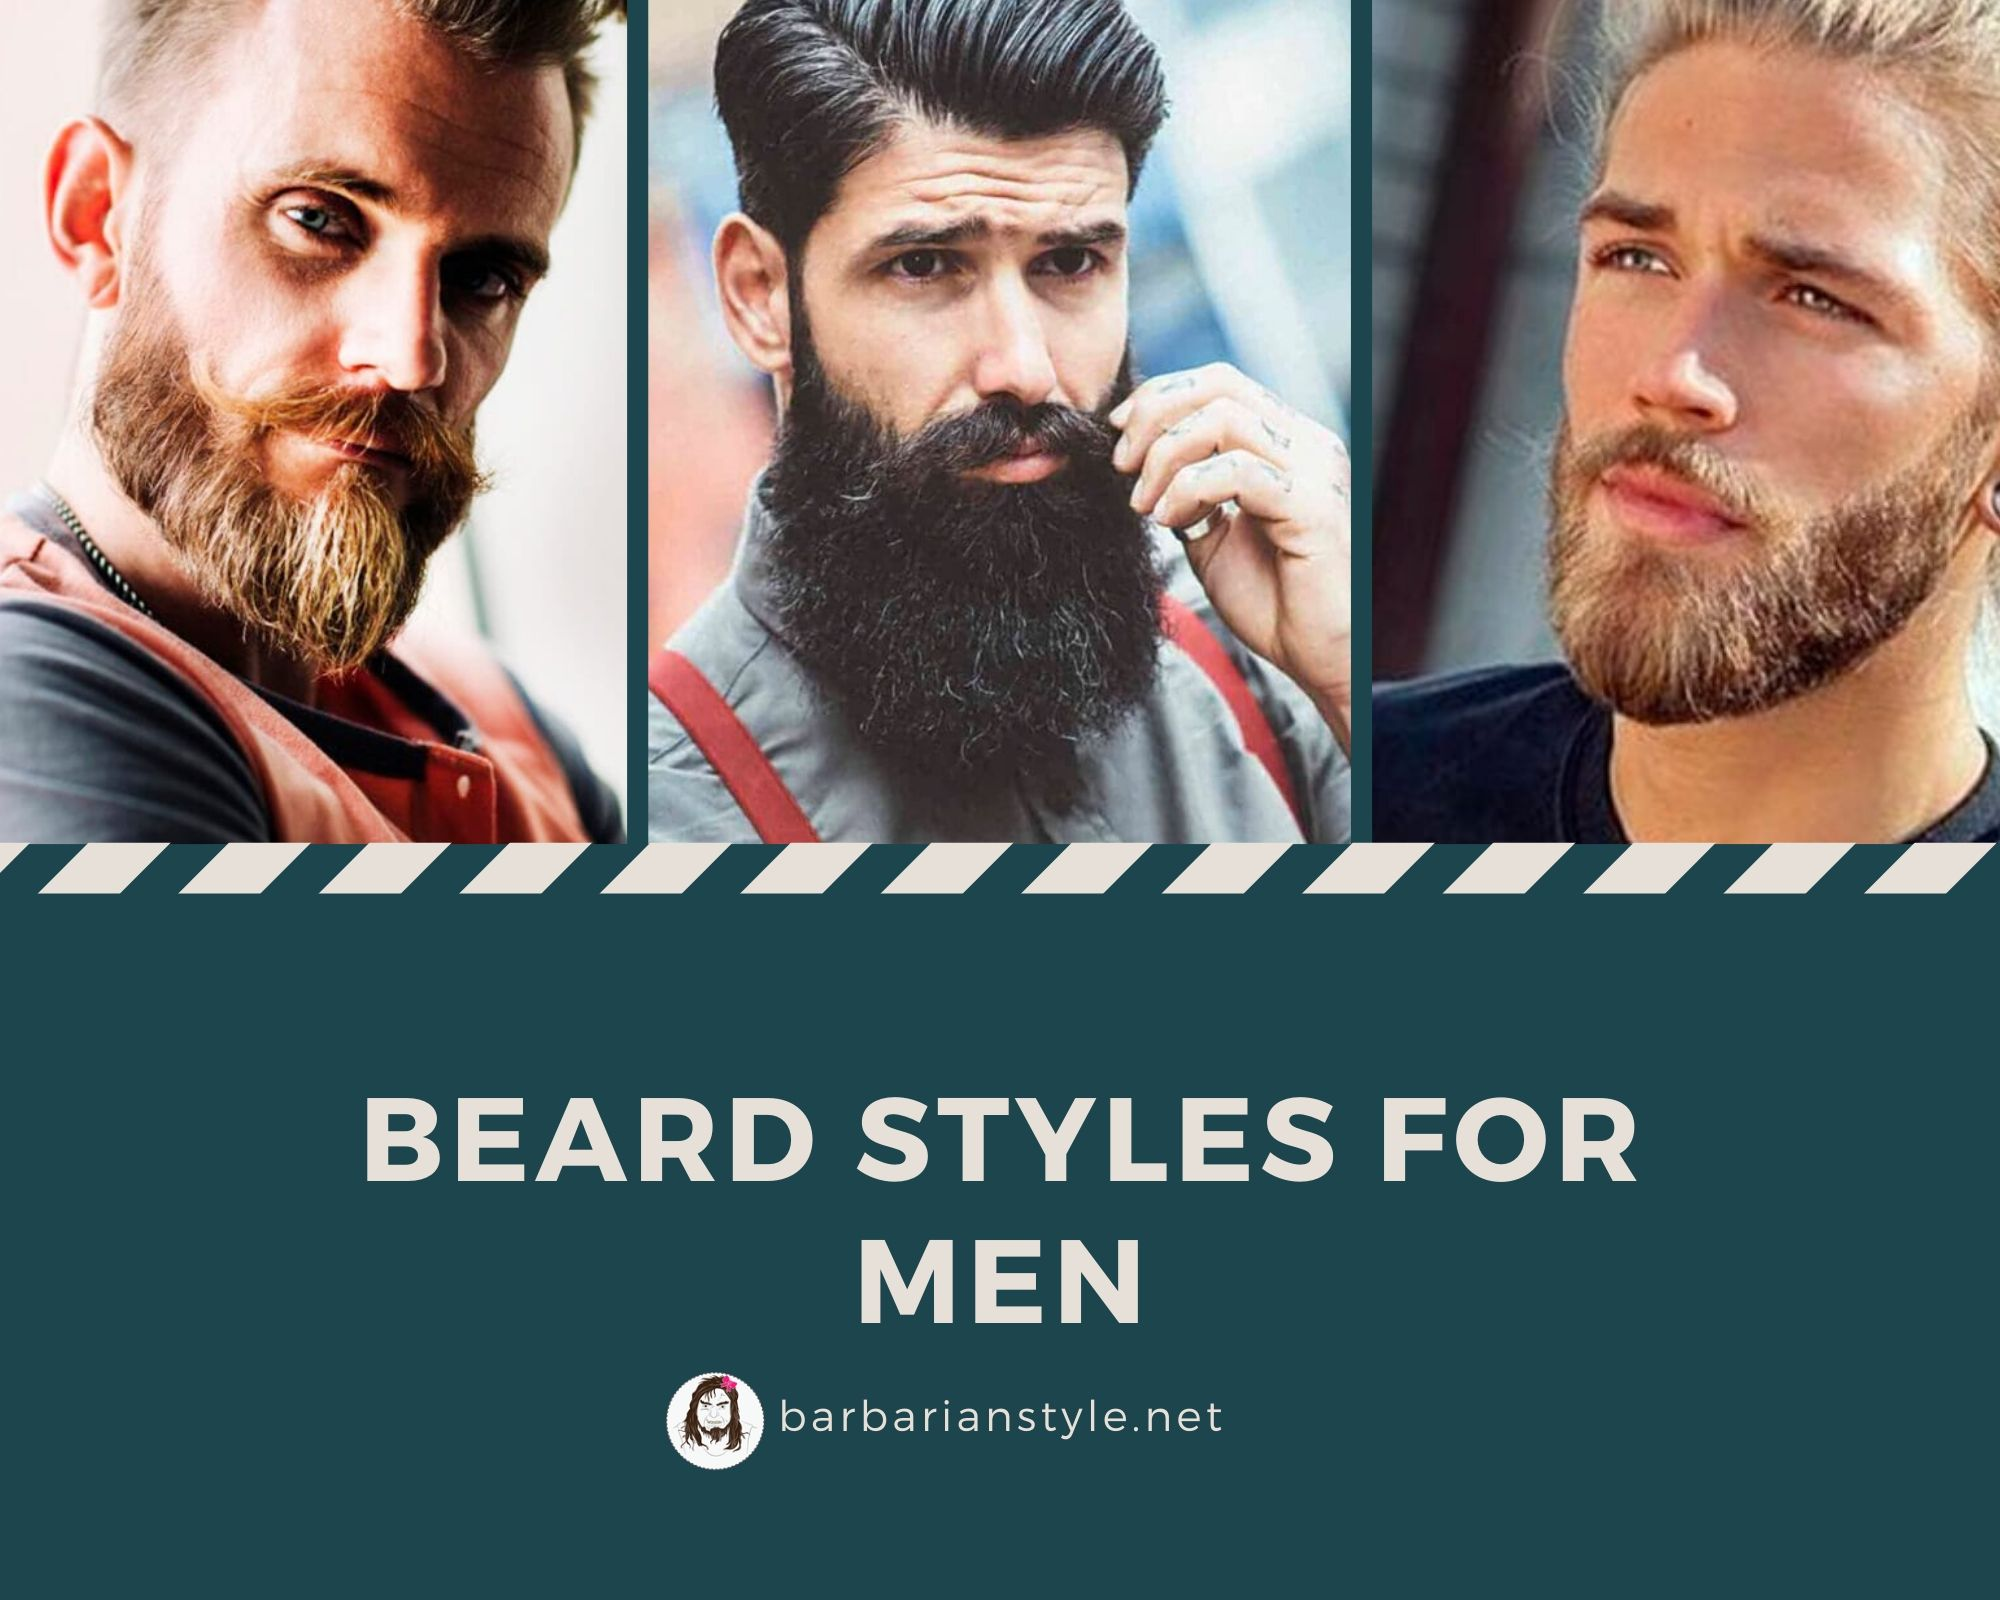 Beard neatly design trimmed 24 Best